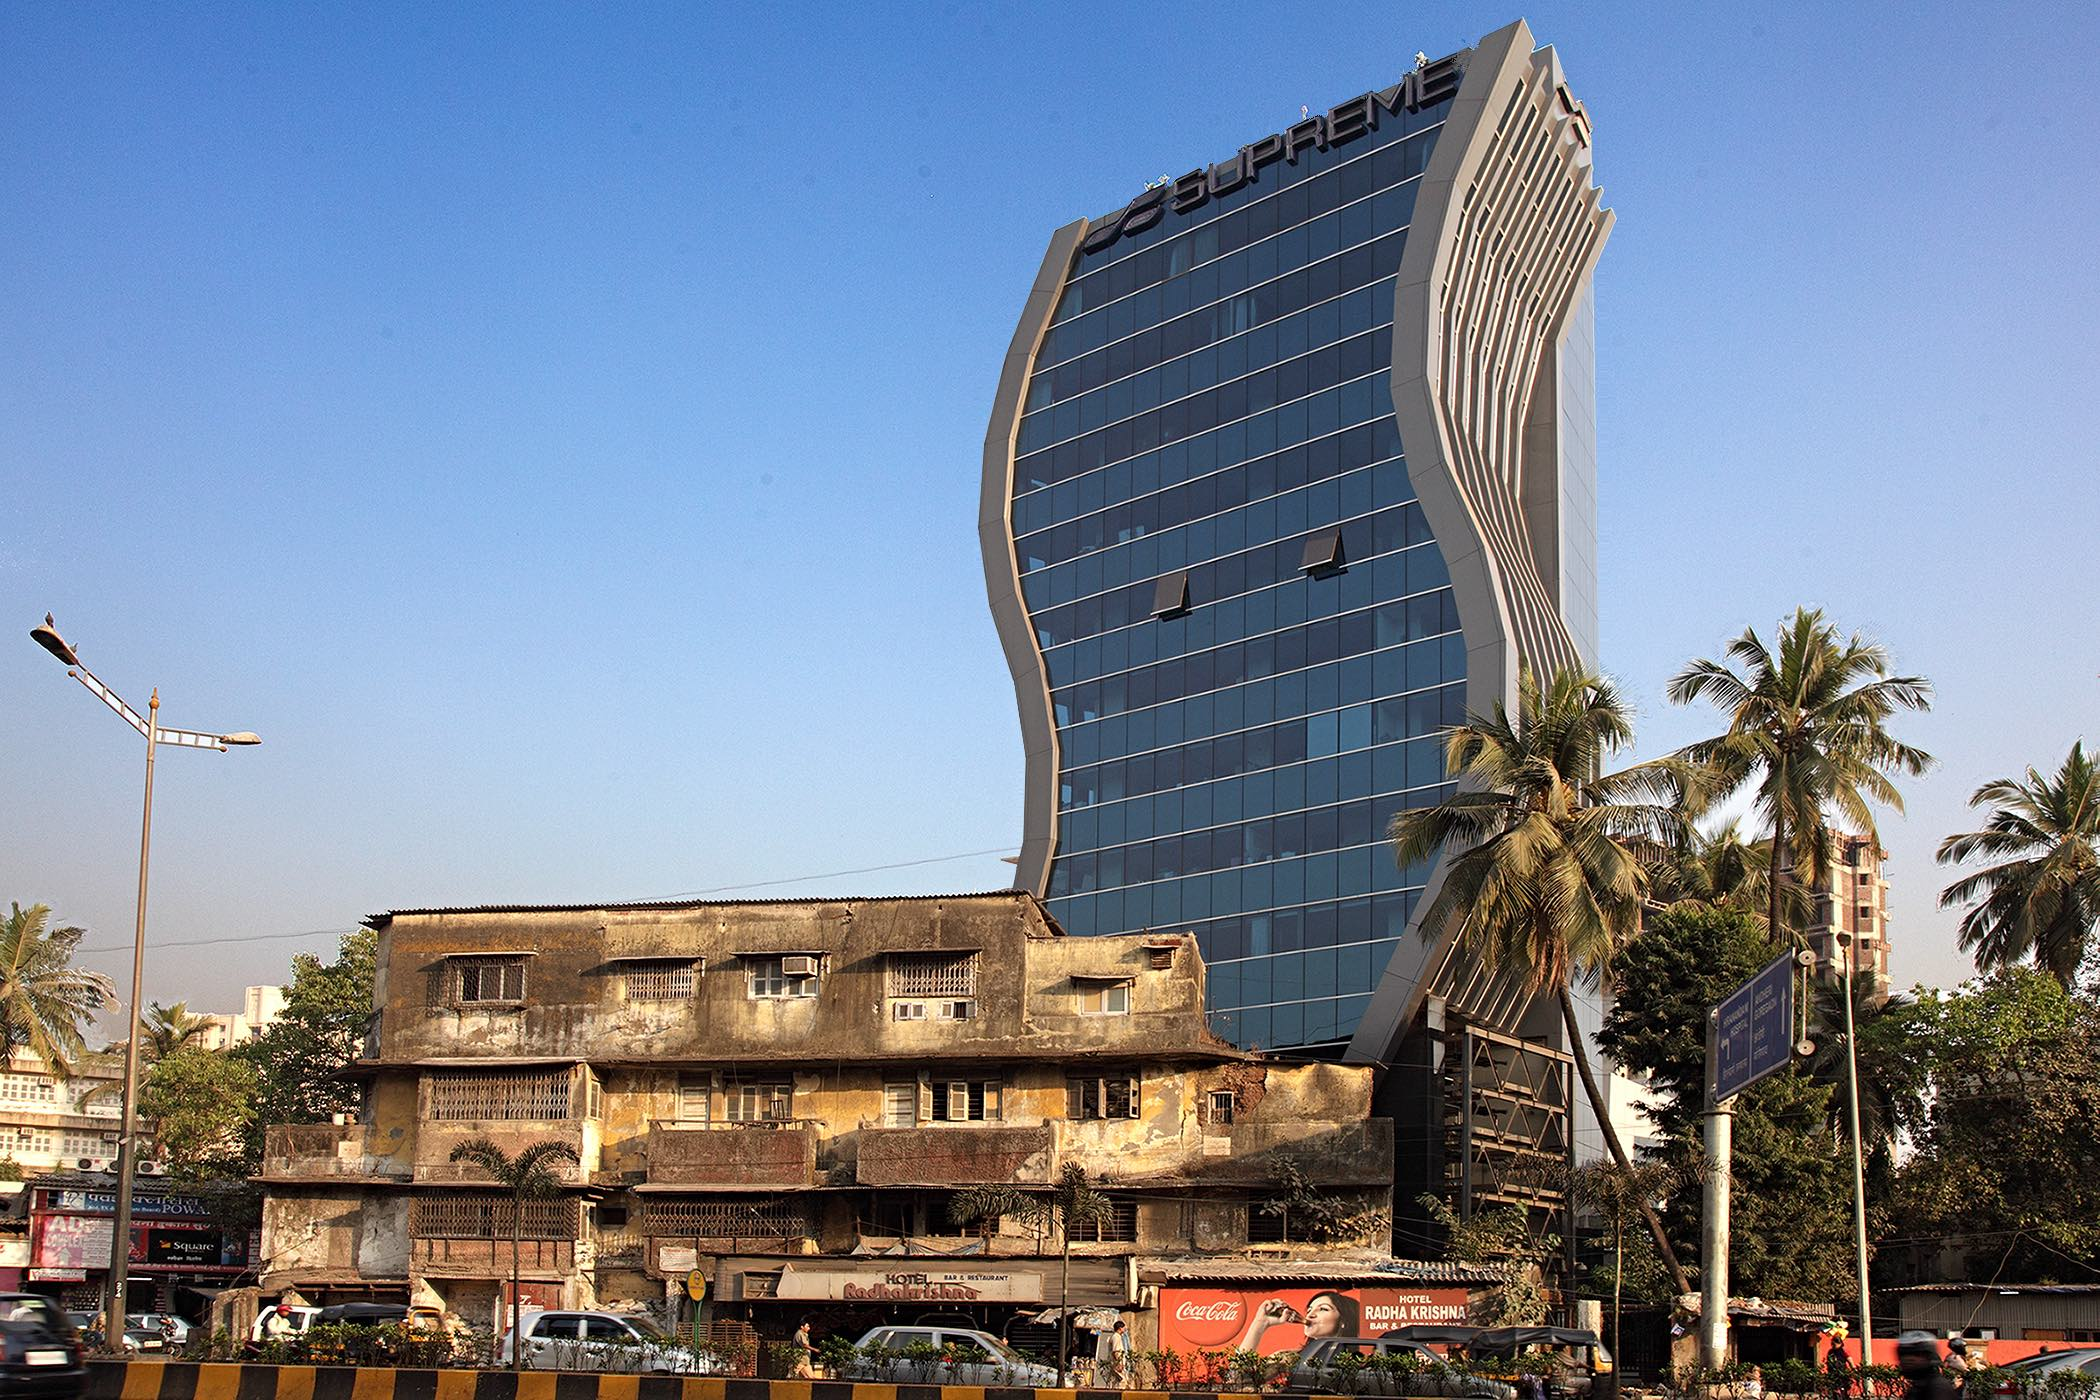 Buildings in Mumbai by Swapan Mukherjee